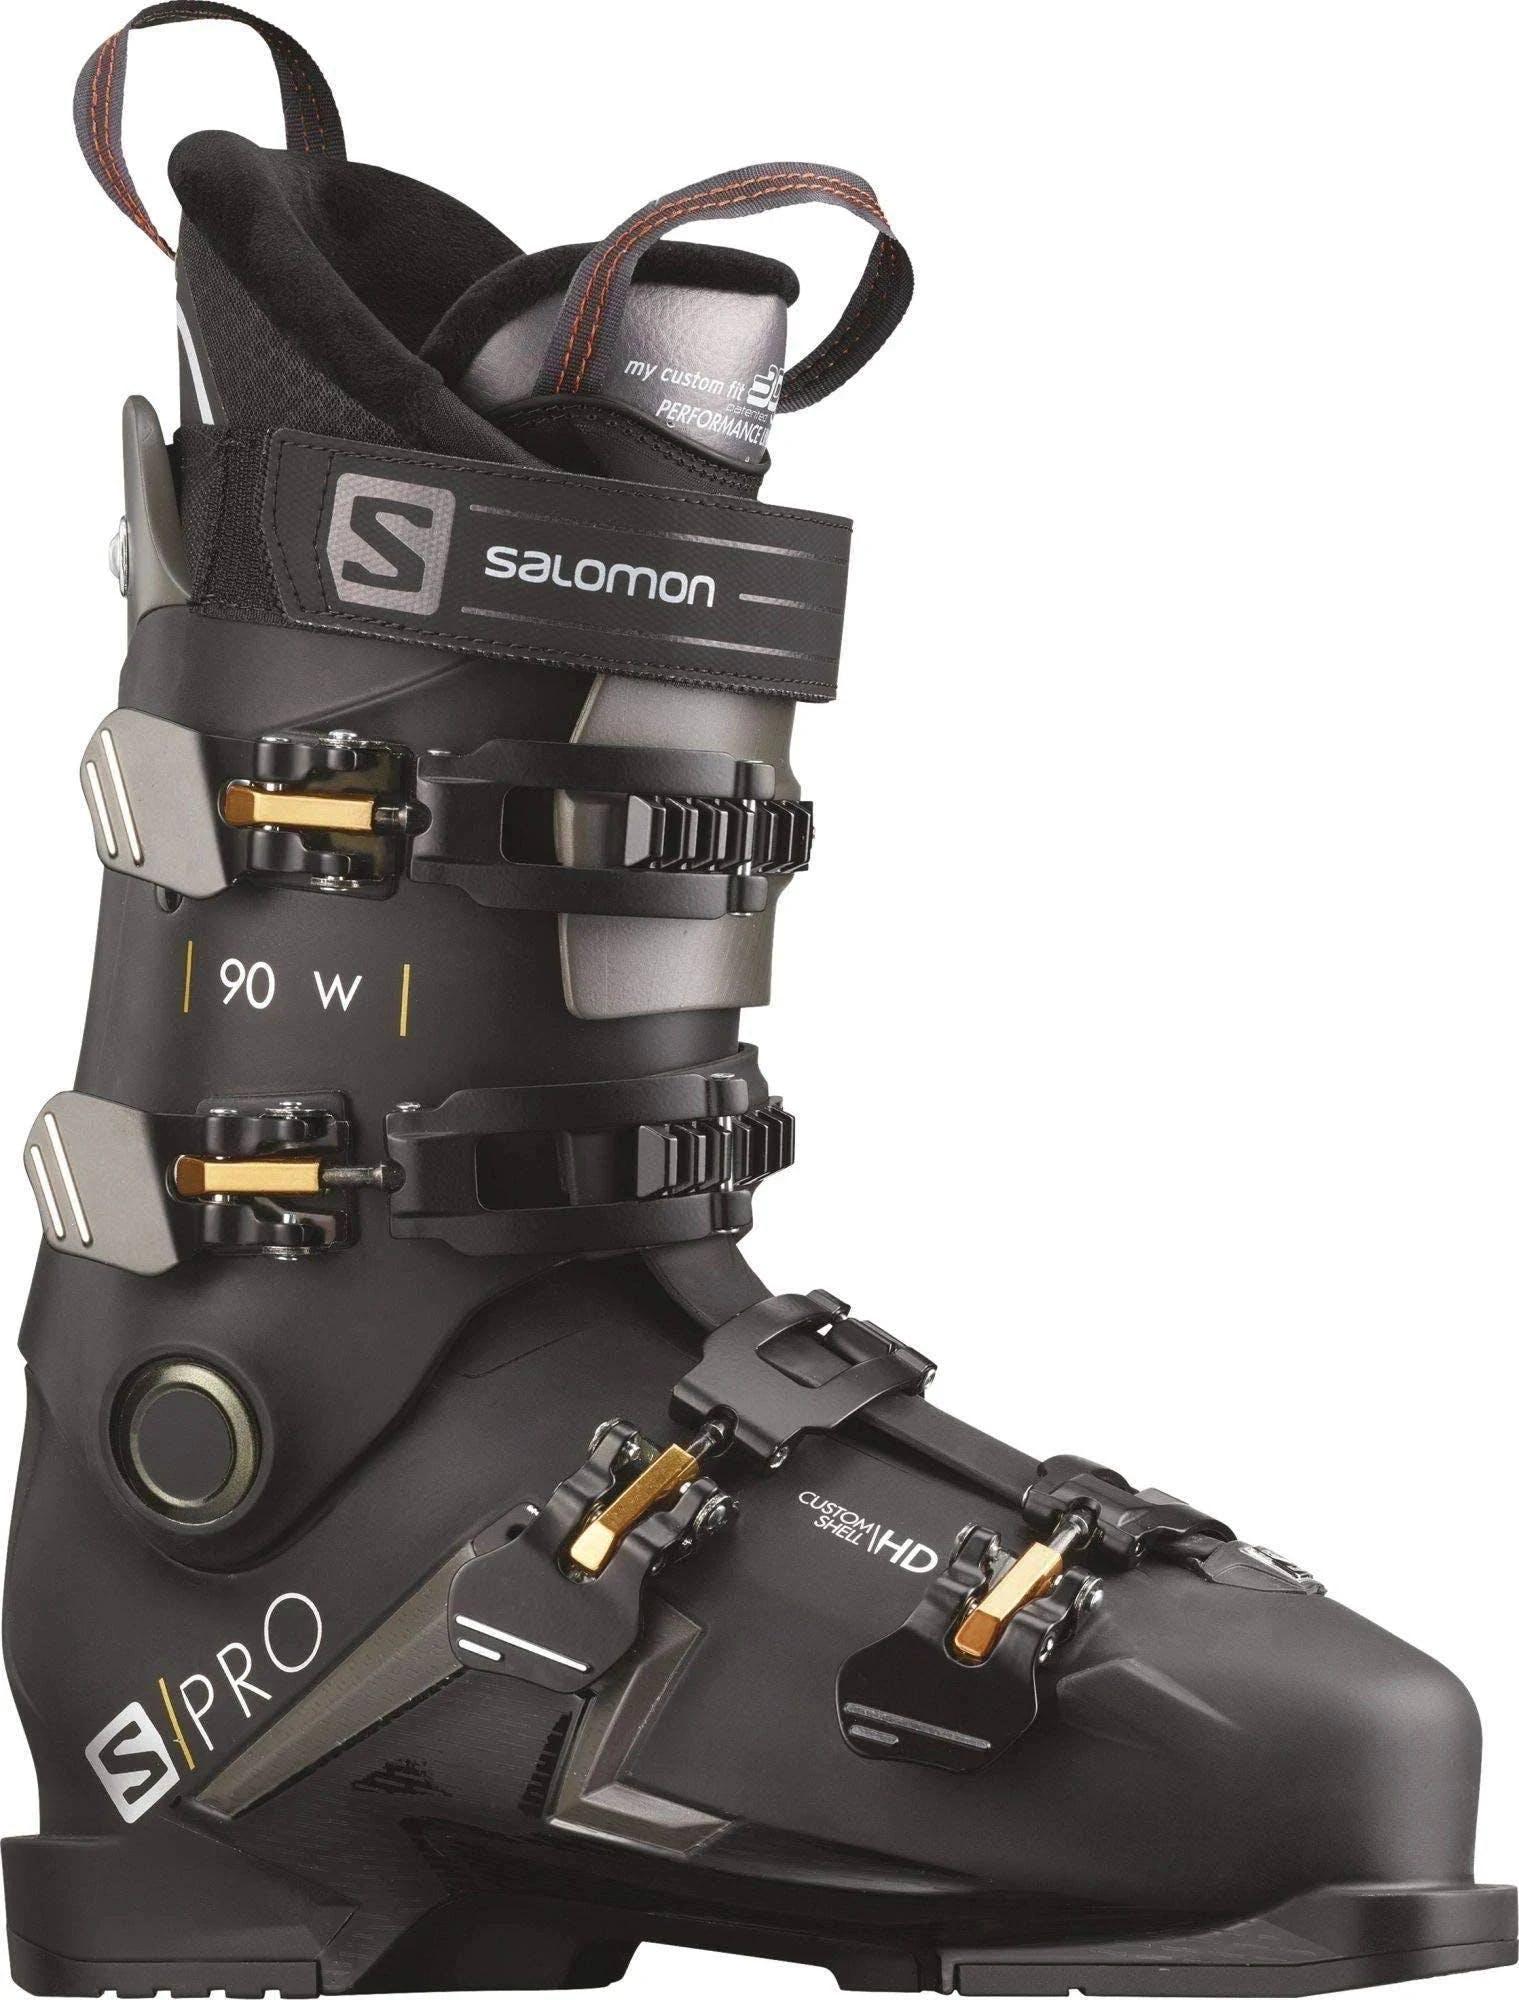 Salomon S/pro 90 Women's Ski Boots